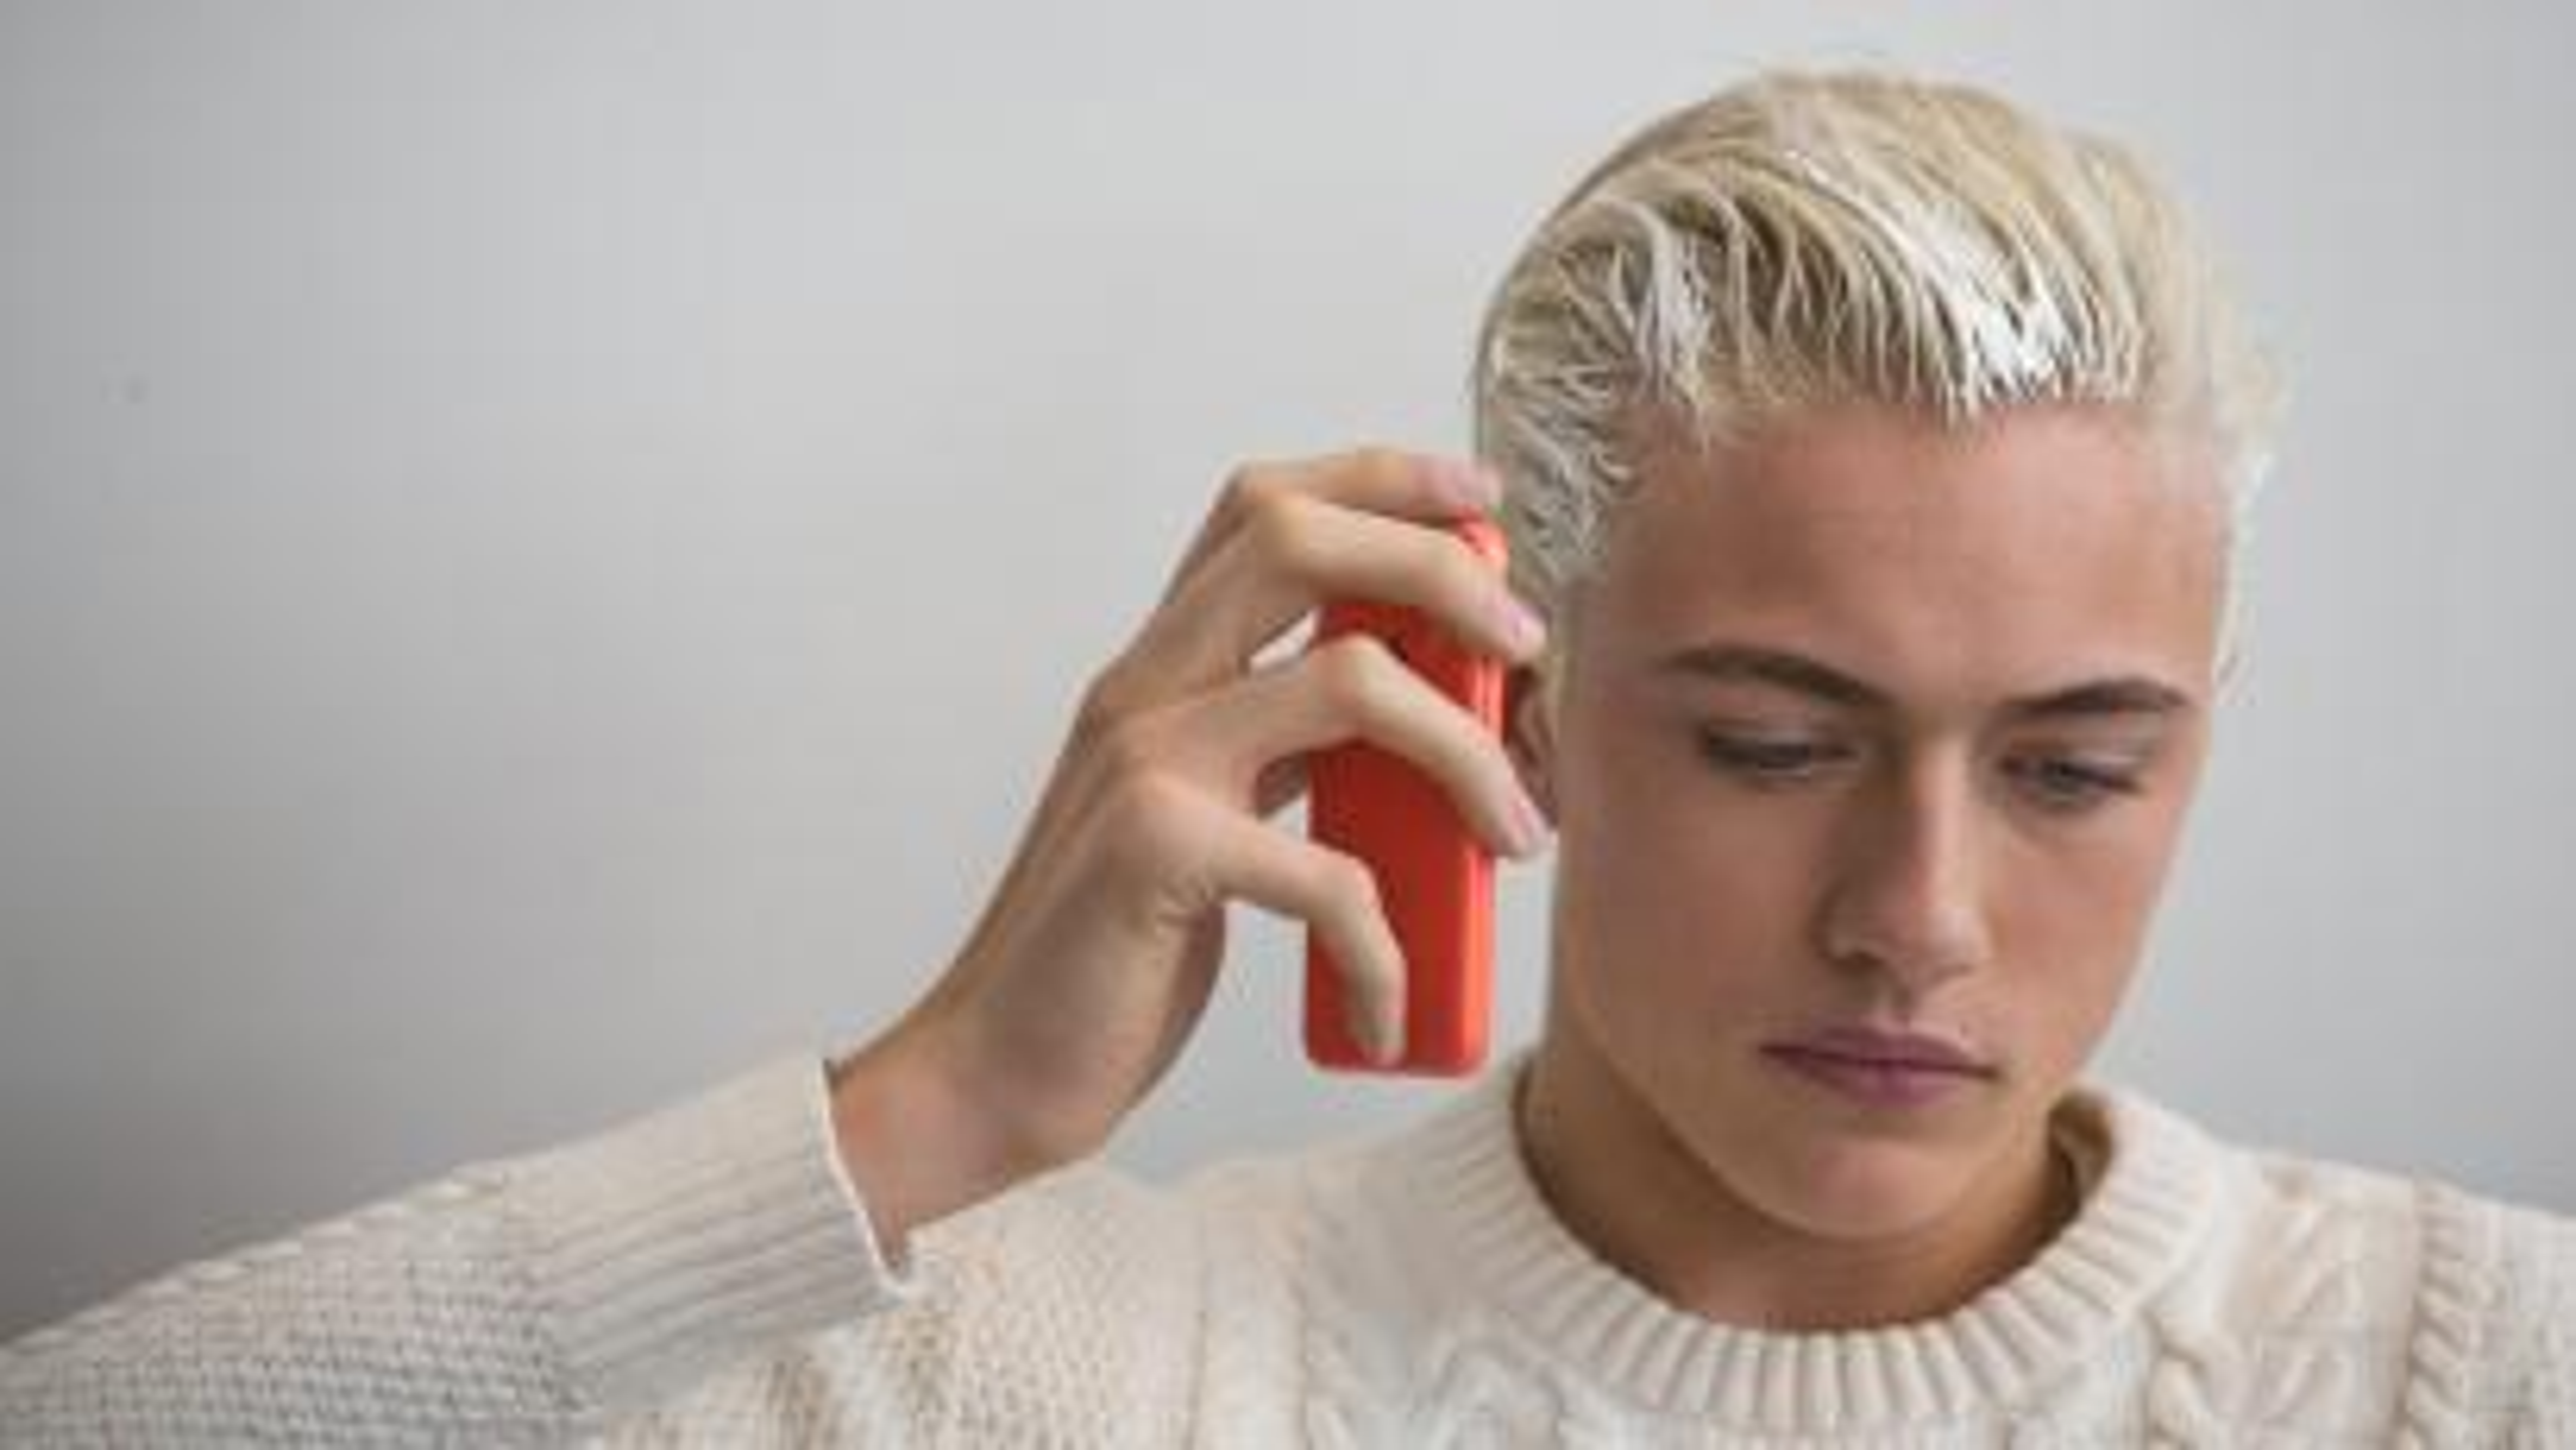 model talking on phone